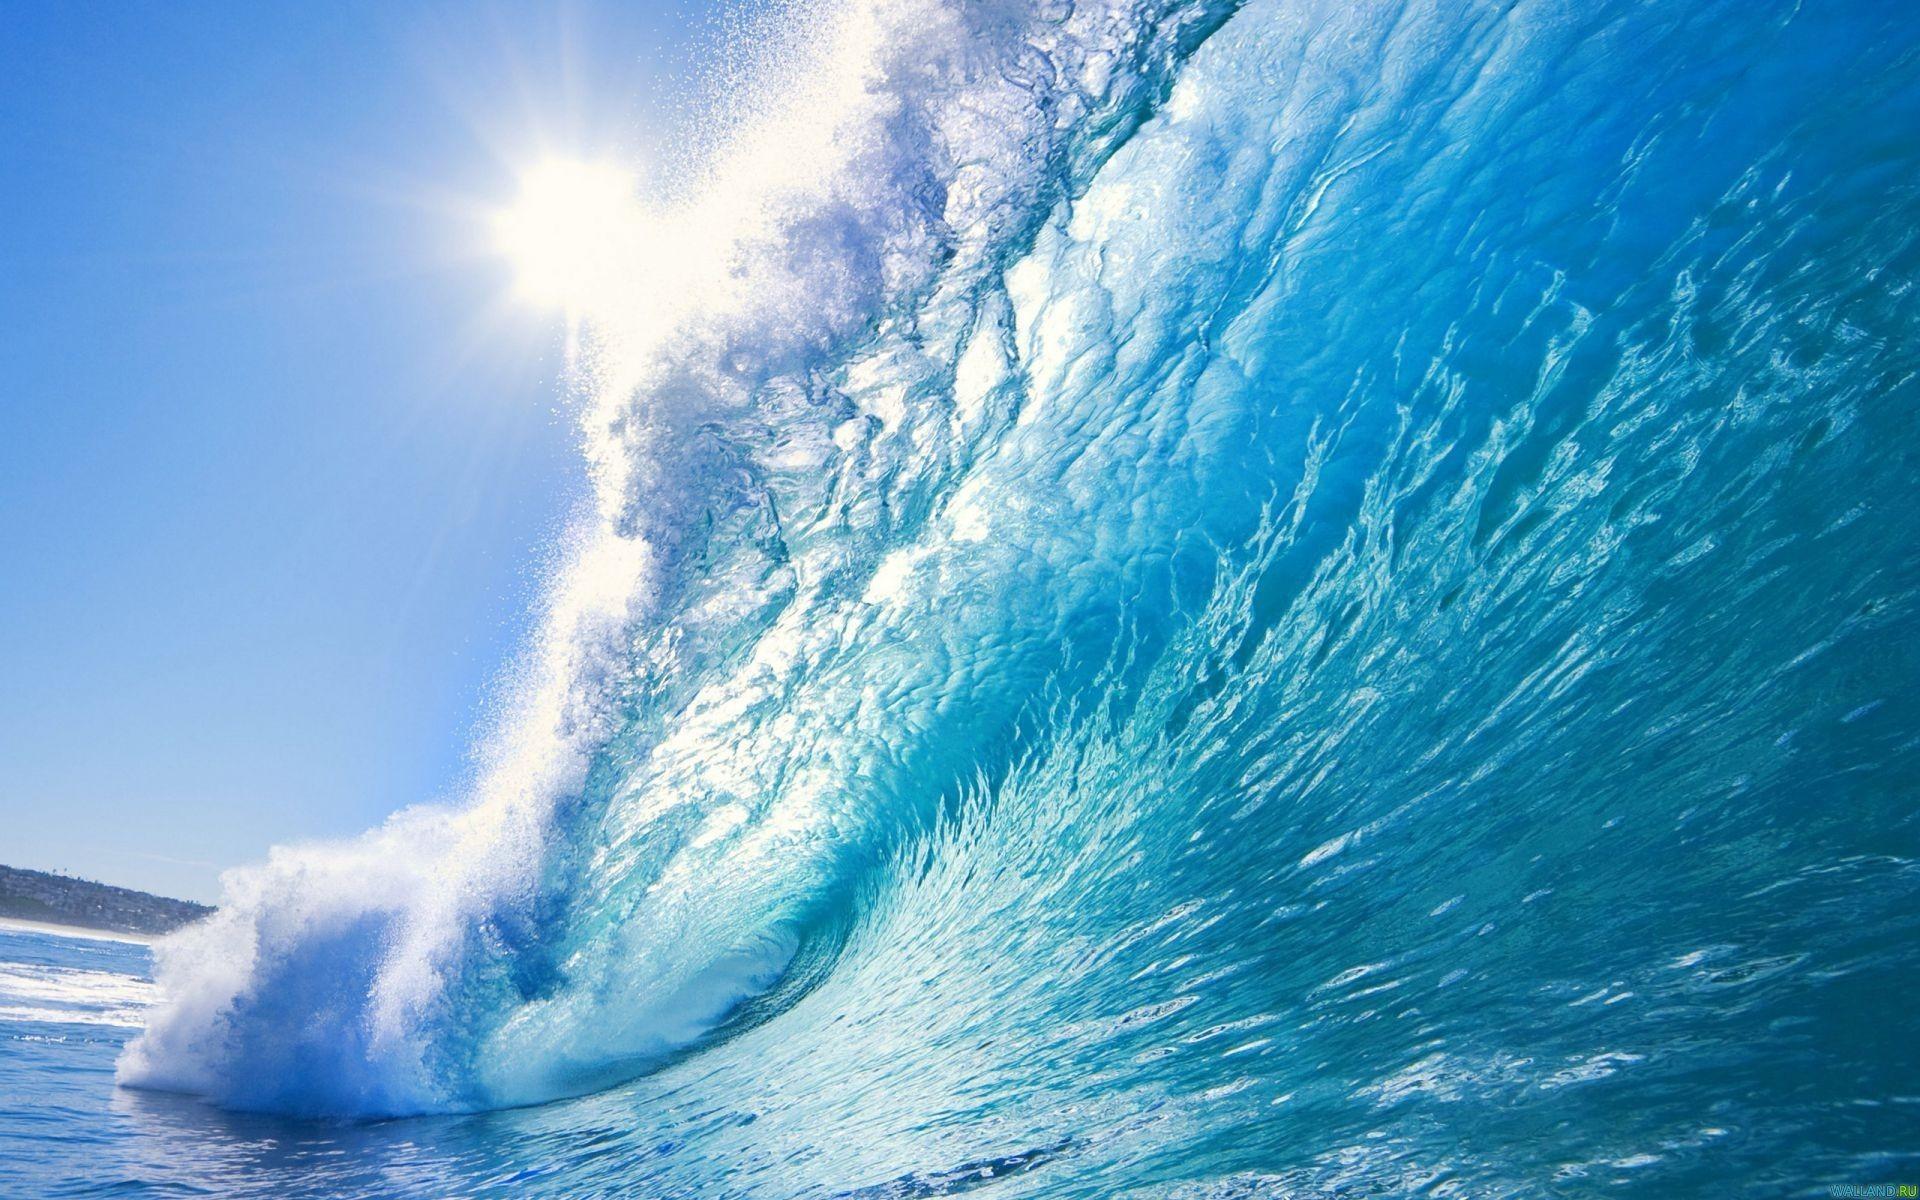 Gorgeous Ocean Waves Wallpaper